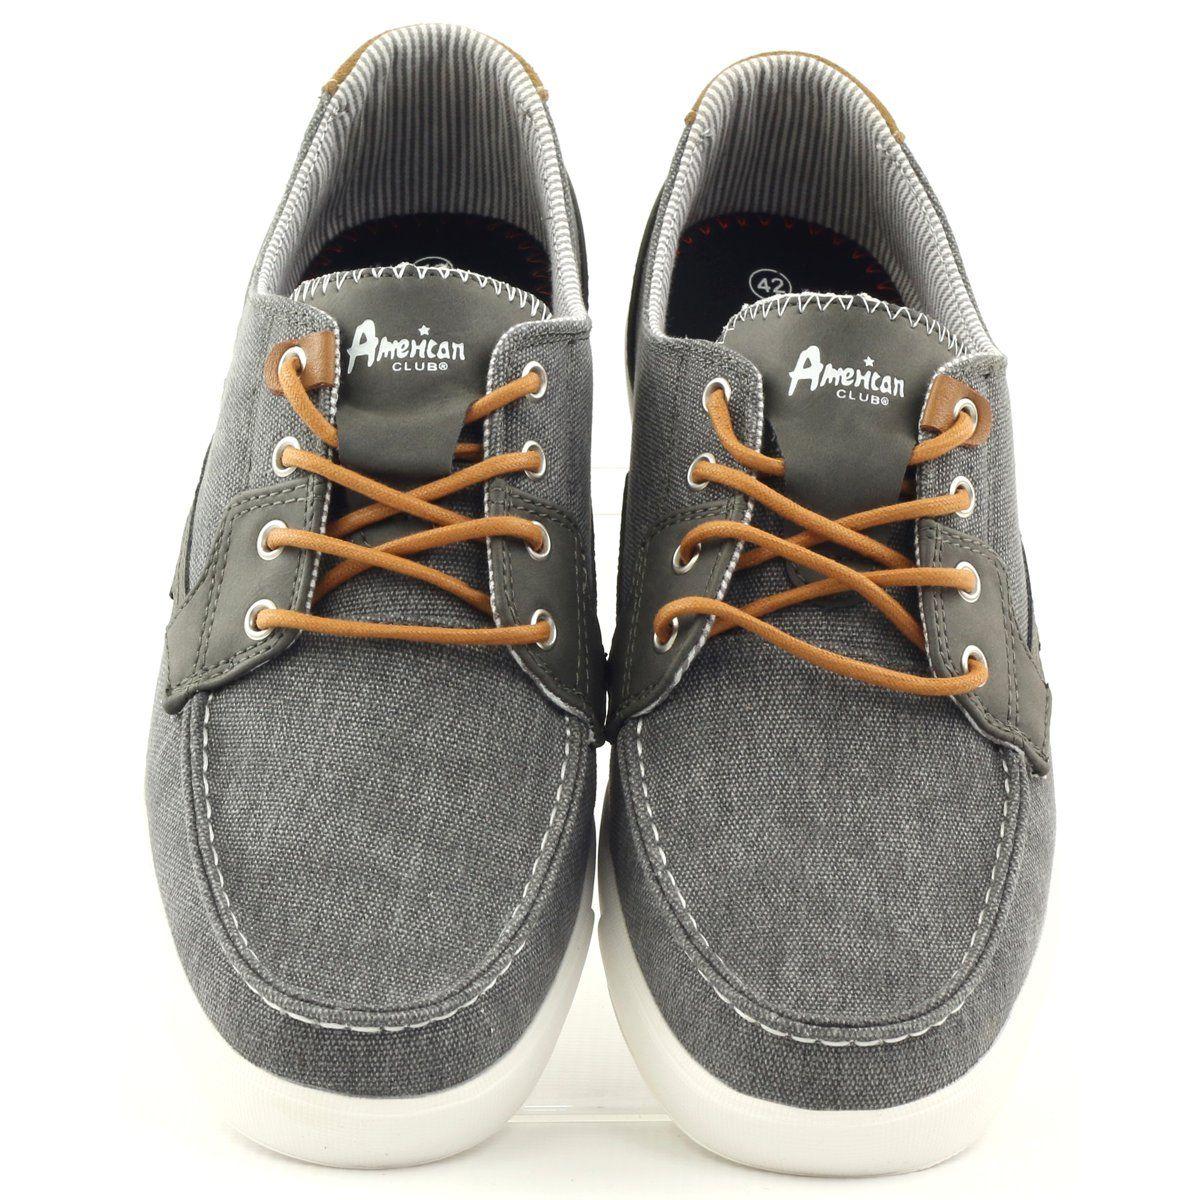 American Club Buty Meskie Mokasyny Tekstylne American 205081 Szare Loafers Shoes Men S Shoes